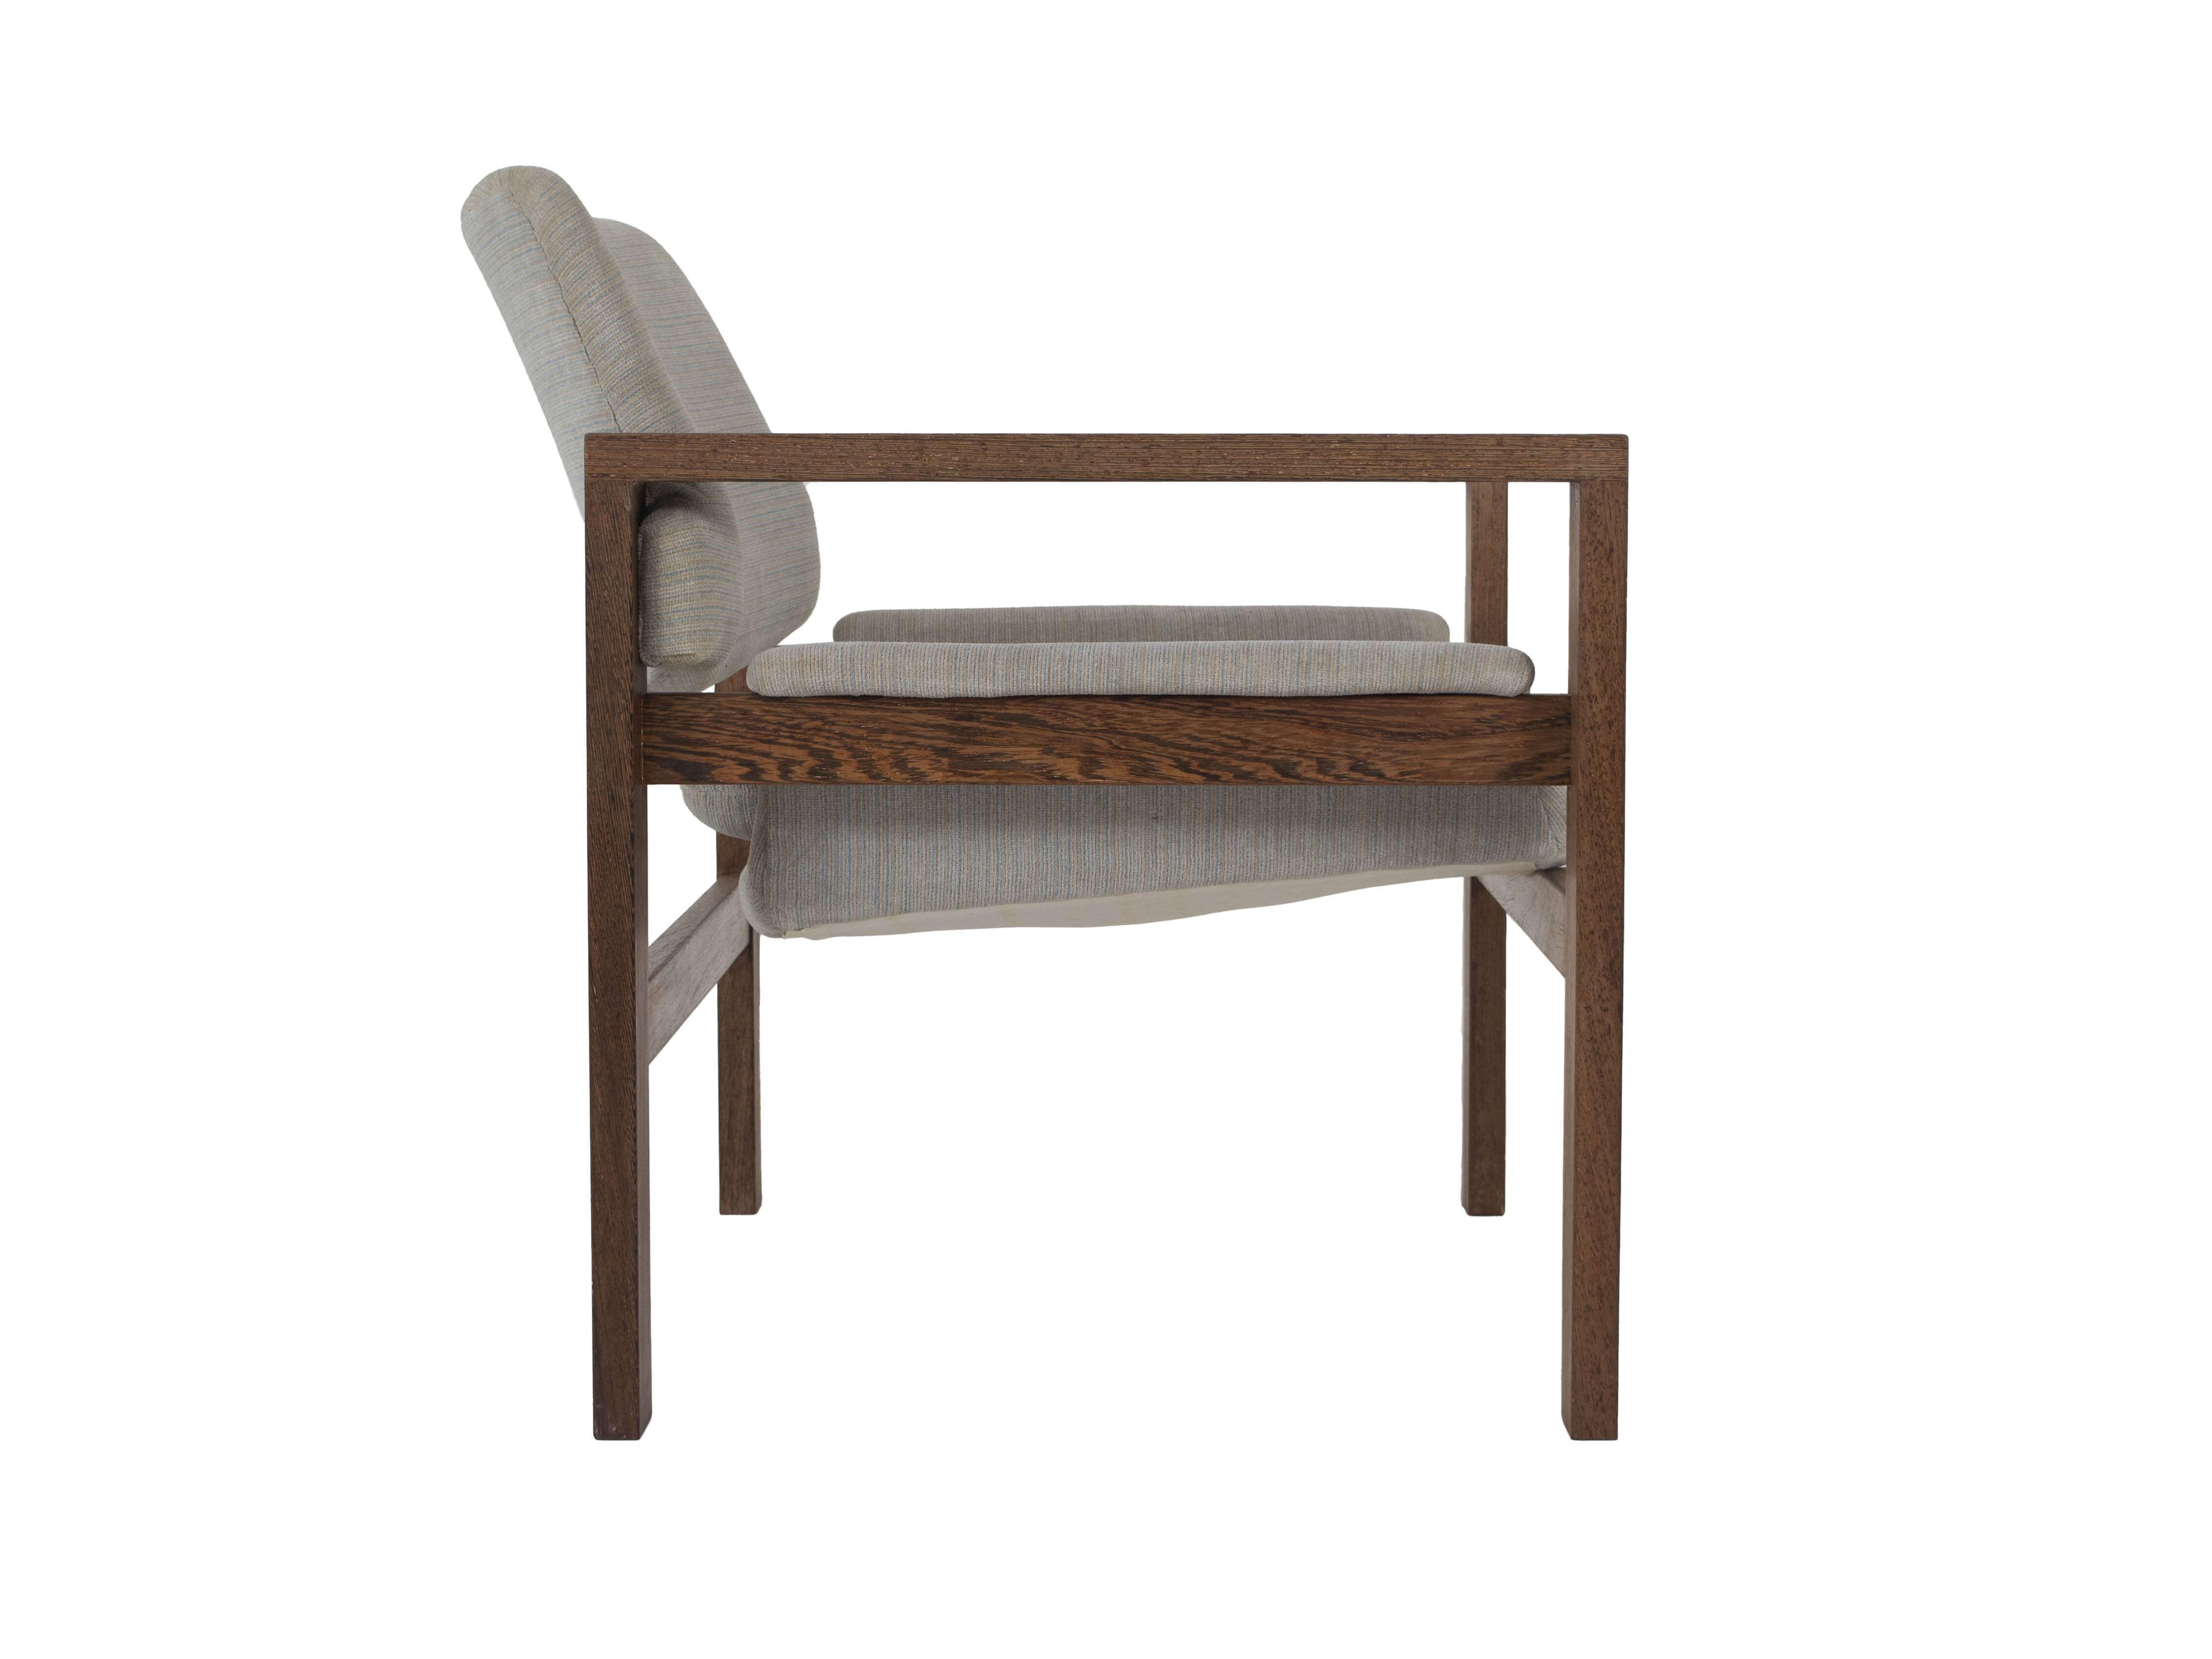 Side view Arm Chair Attributed to Martin Visser 't Spectrum